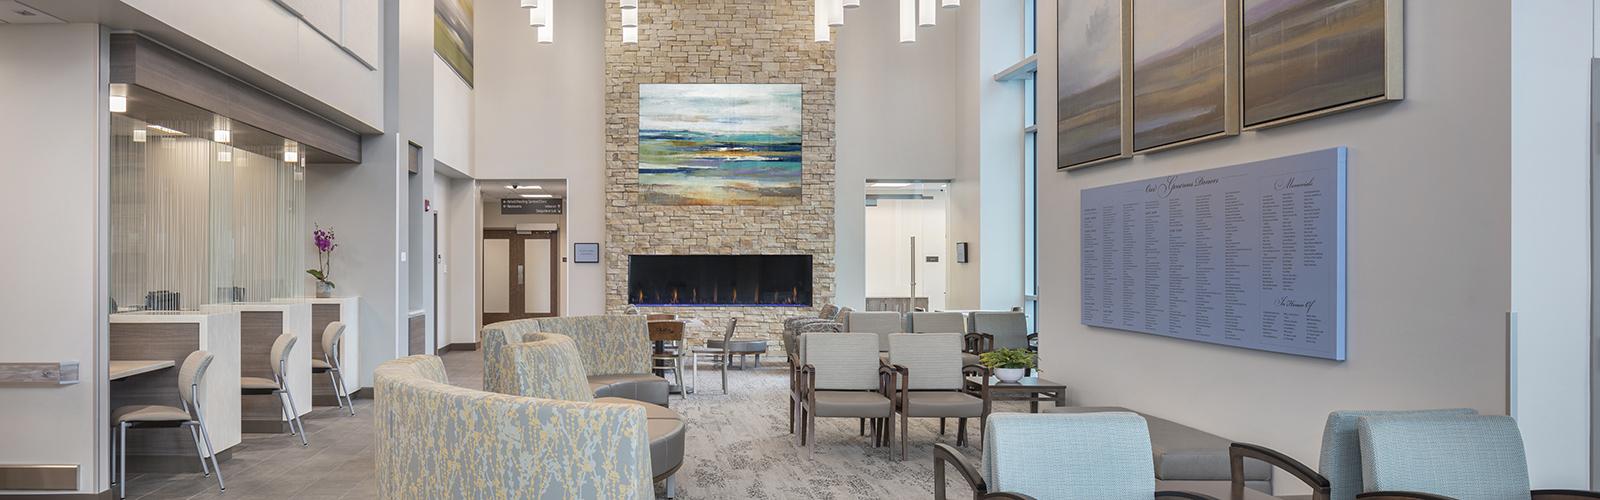 Olathe Medical Center - Cancer Center 2